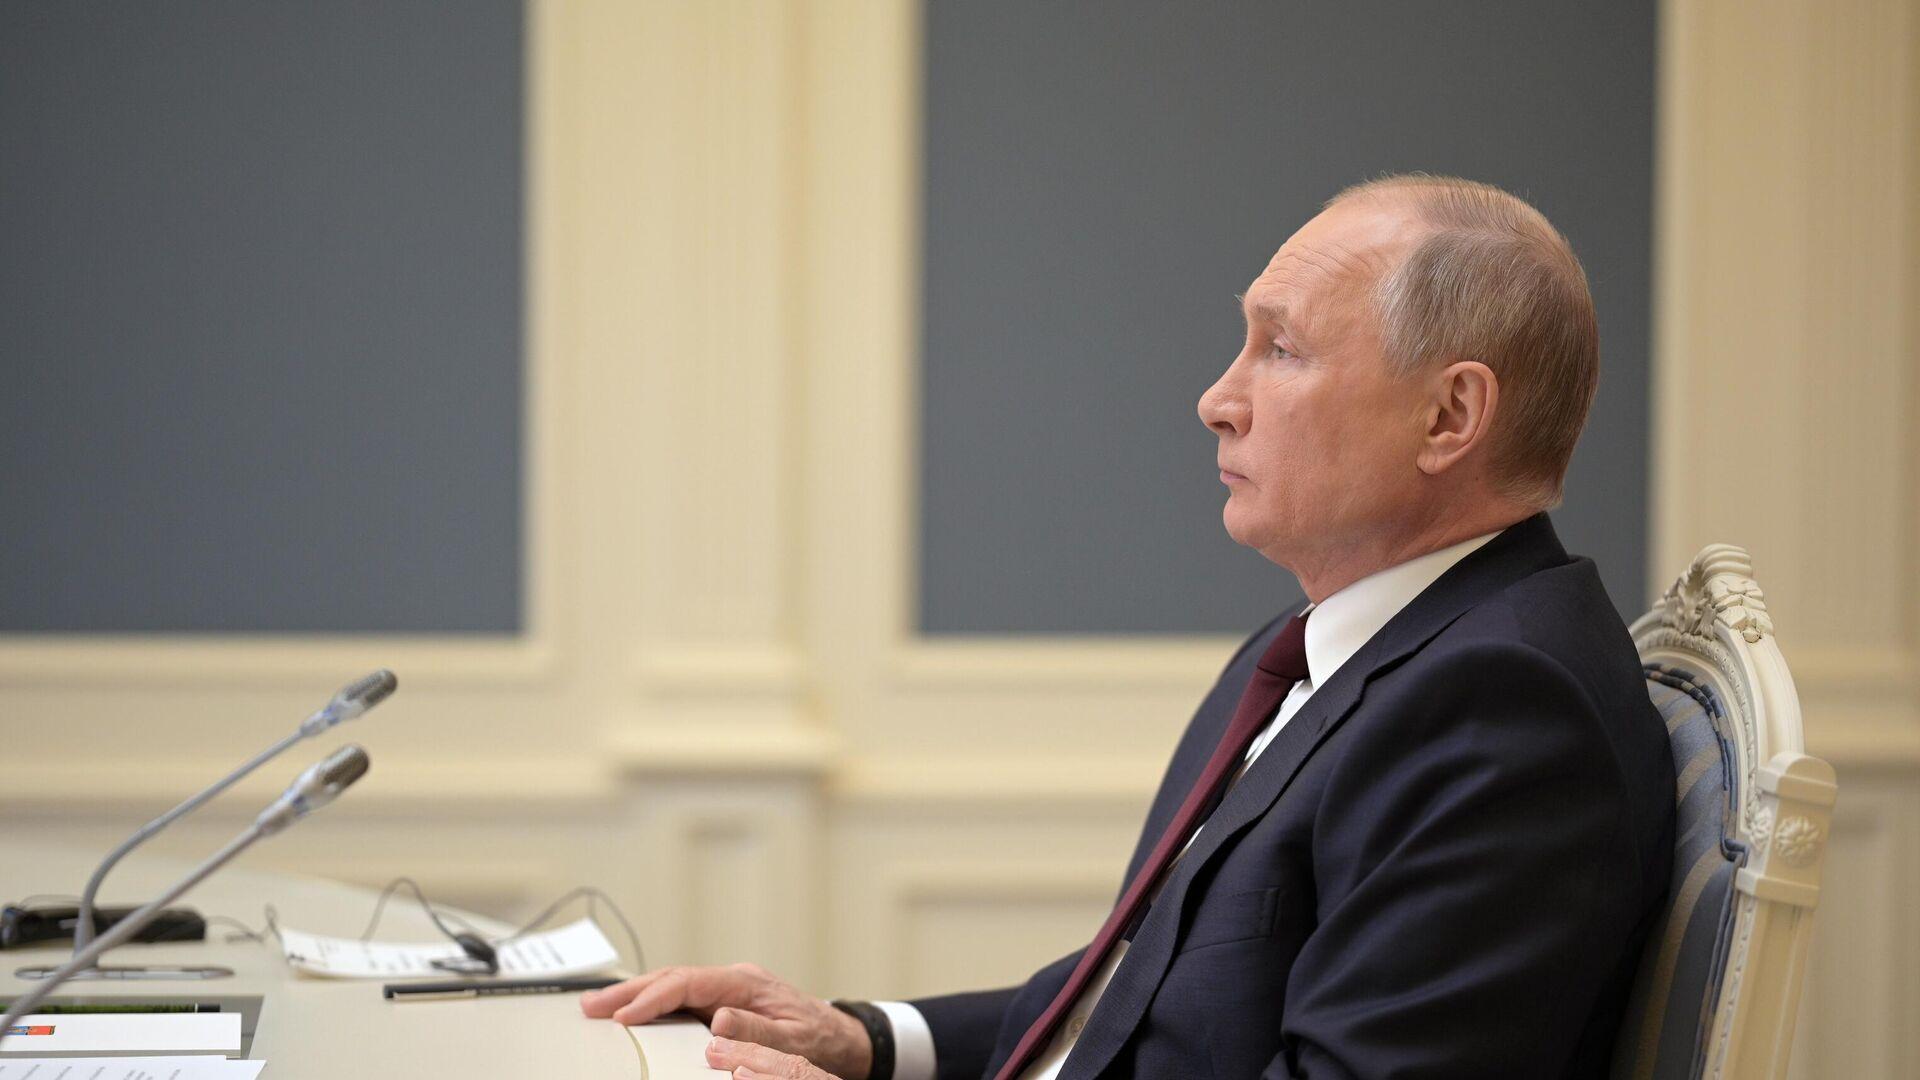 Vladímir Putin, presidente de Rusia - Sputnik Mundo, 1920, 22.04.2021